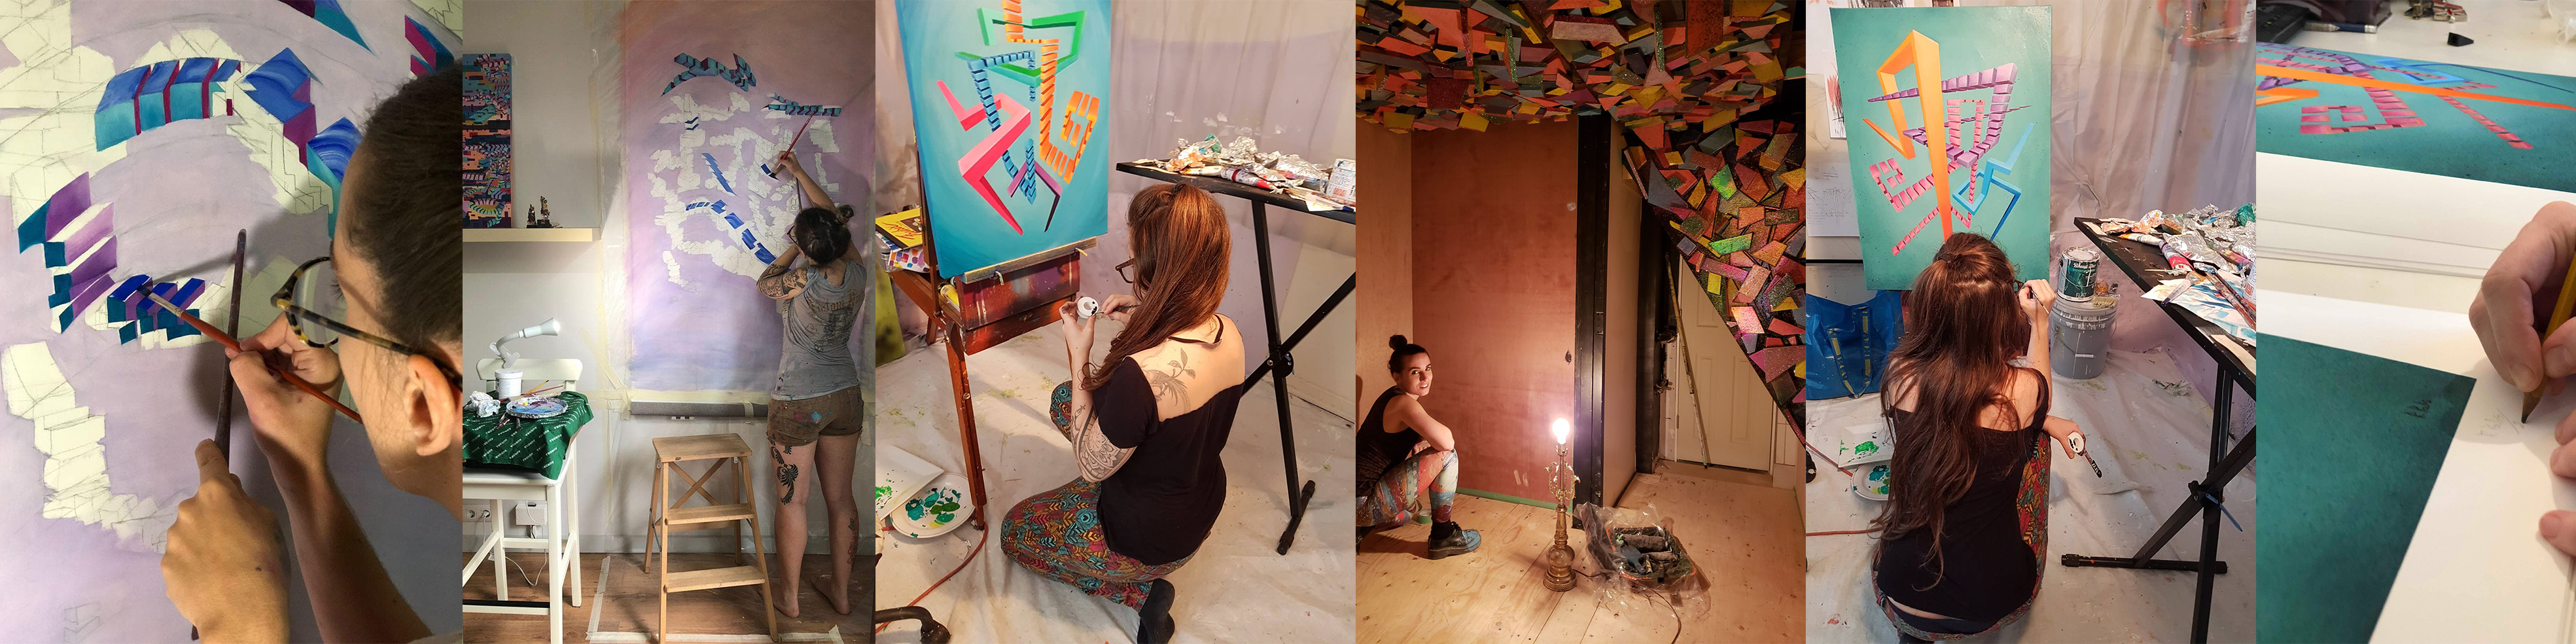 Artist in studio creative art process